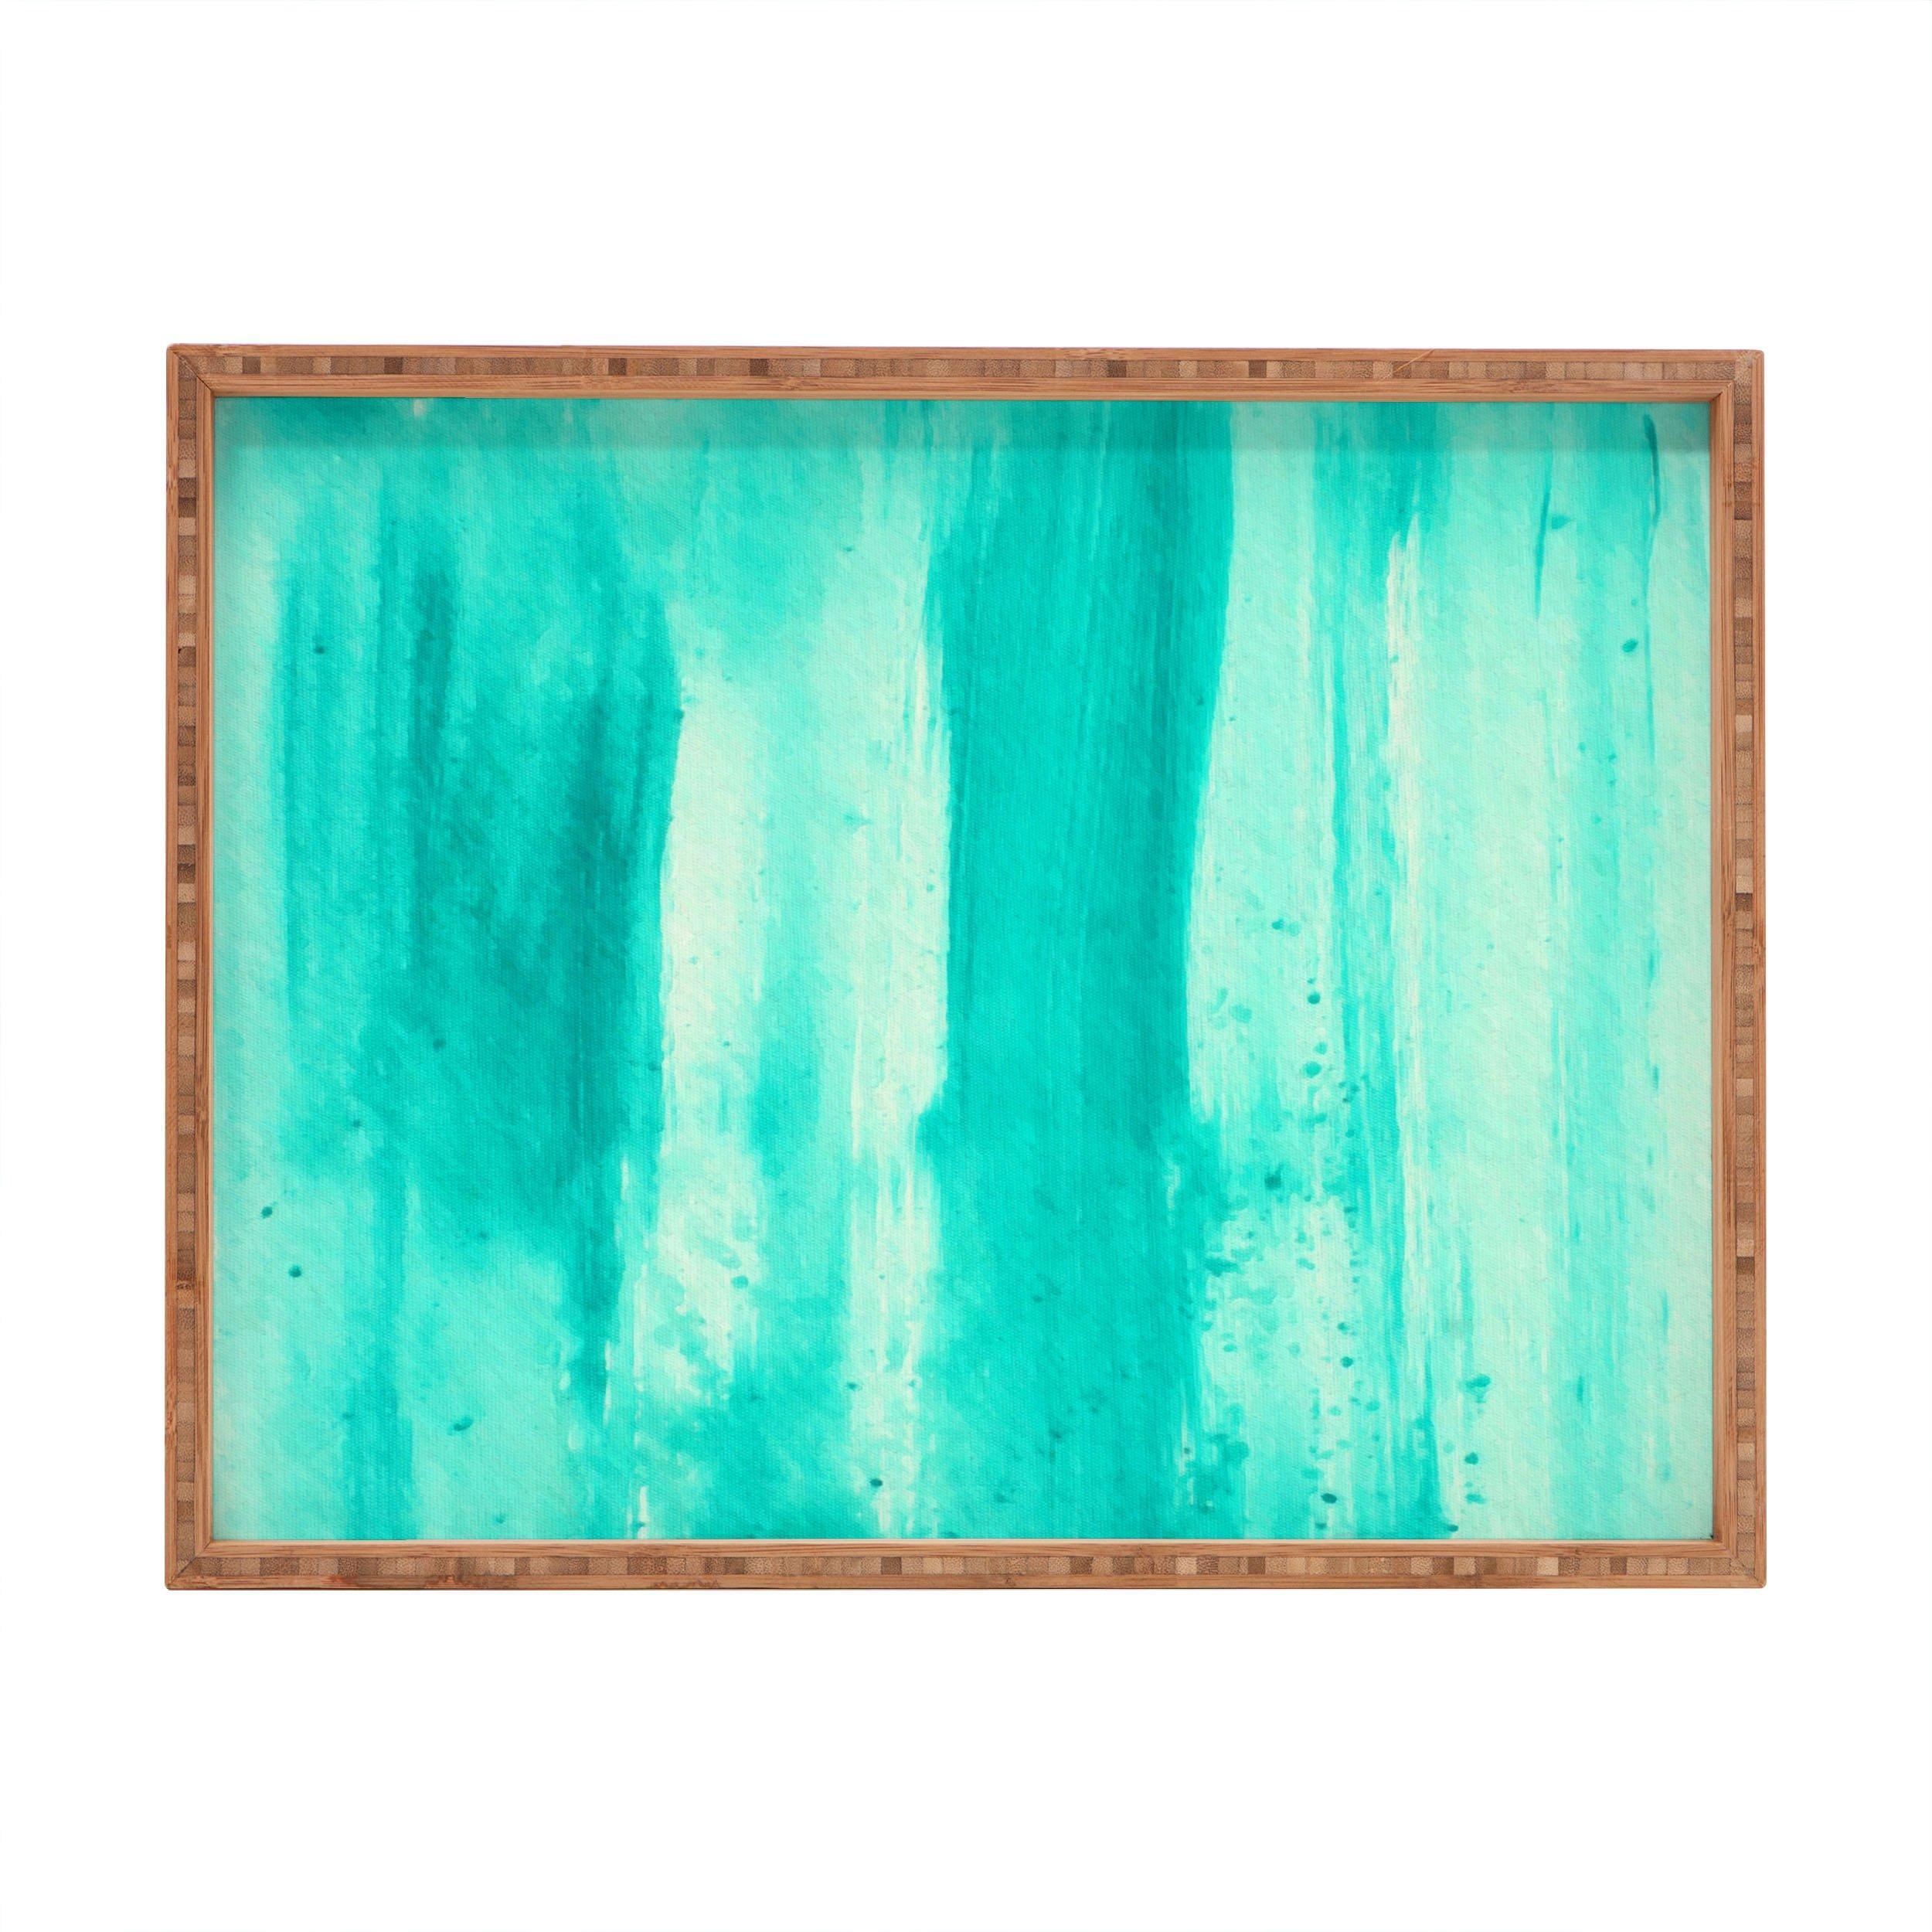 Deny Designs Madart Inc. Modern Dance Aqua Passion Indoor/Outdoor Rectangular Tray, 14 x 18